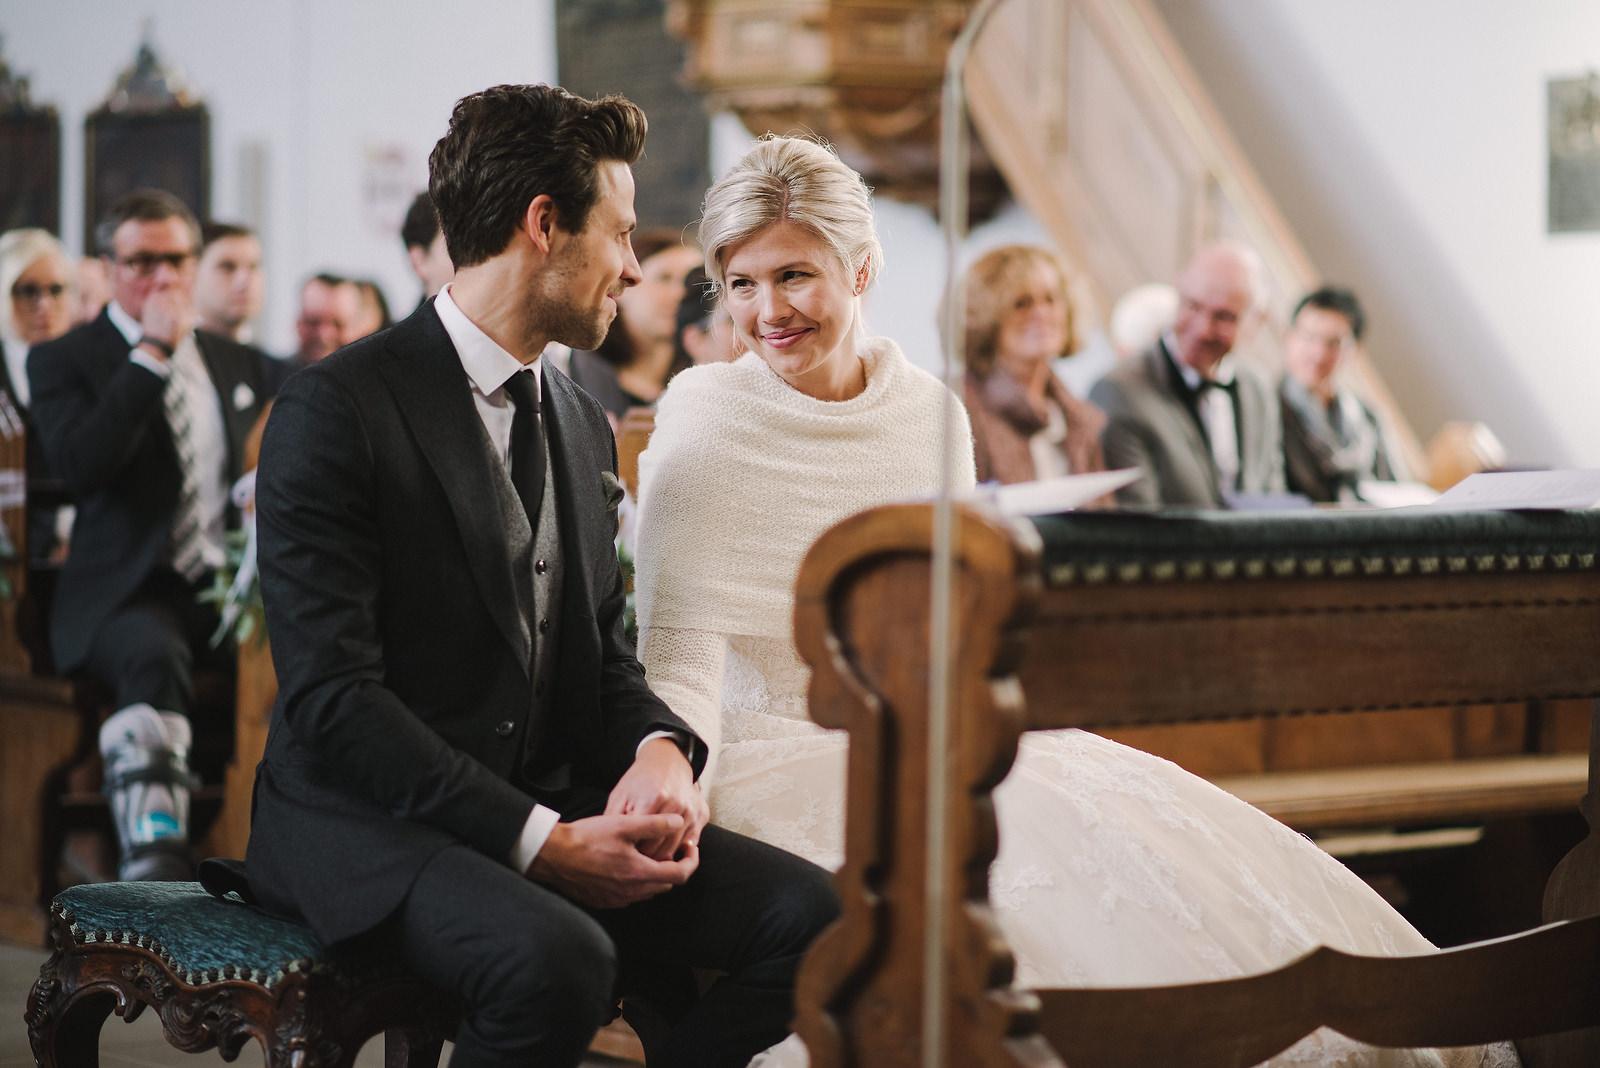 Fotograf Konstanz - Silvester Wedding in Hagnau / Friedrichshafen at Lake of Constance  - 12 -